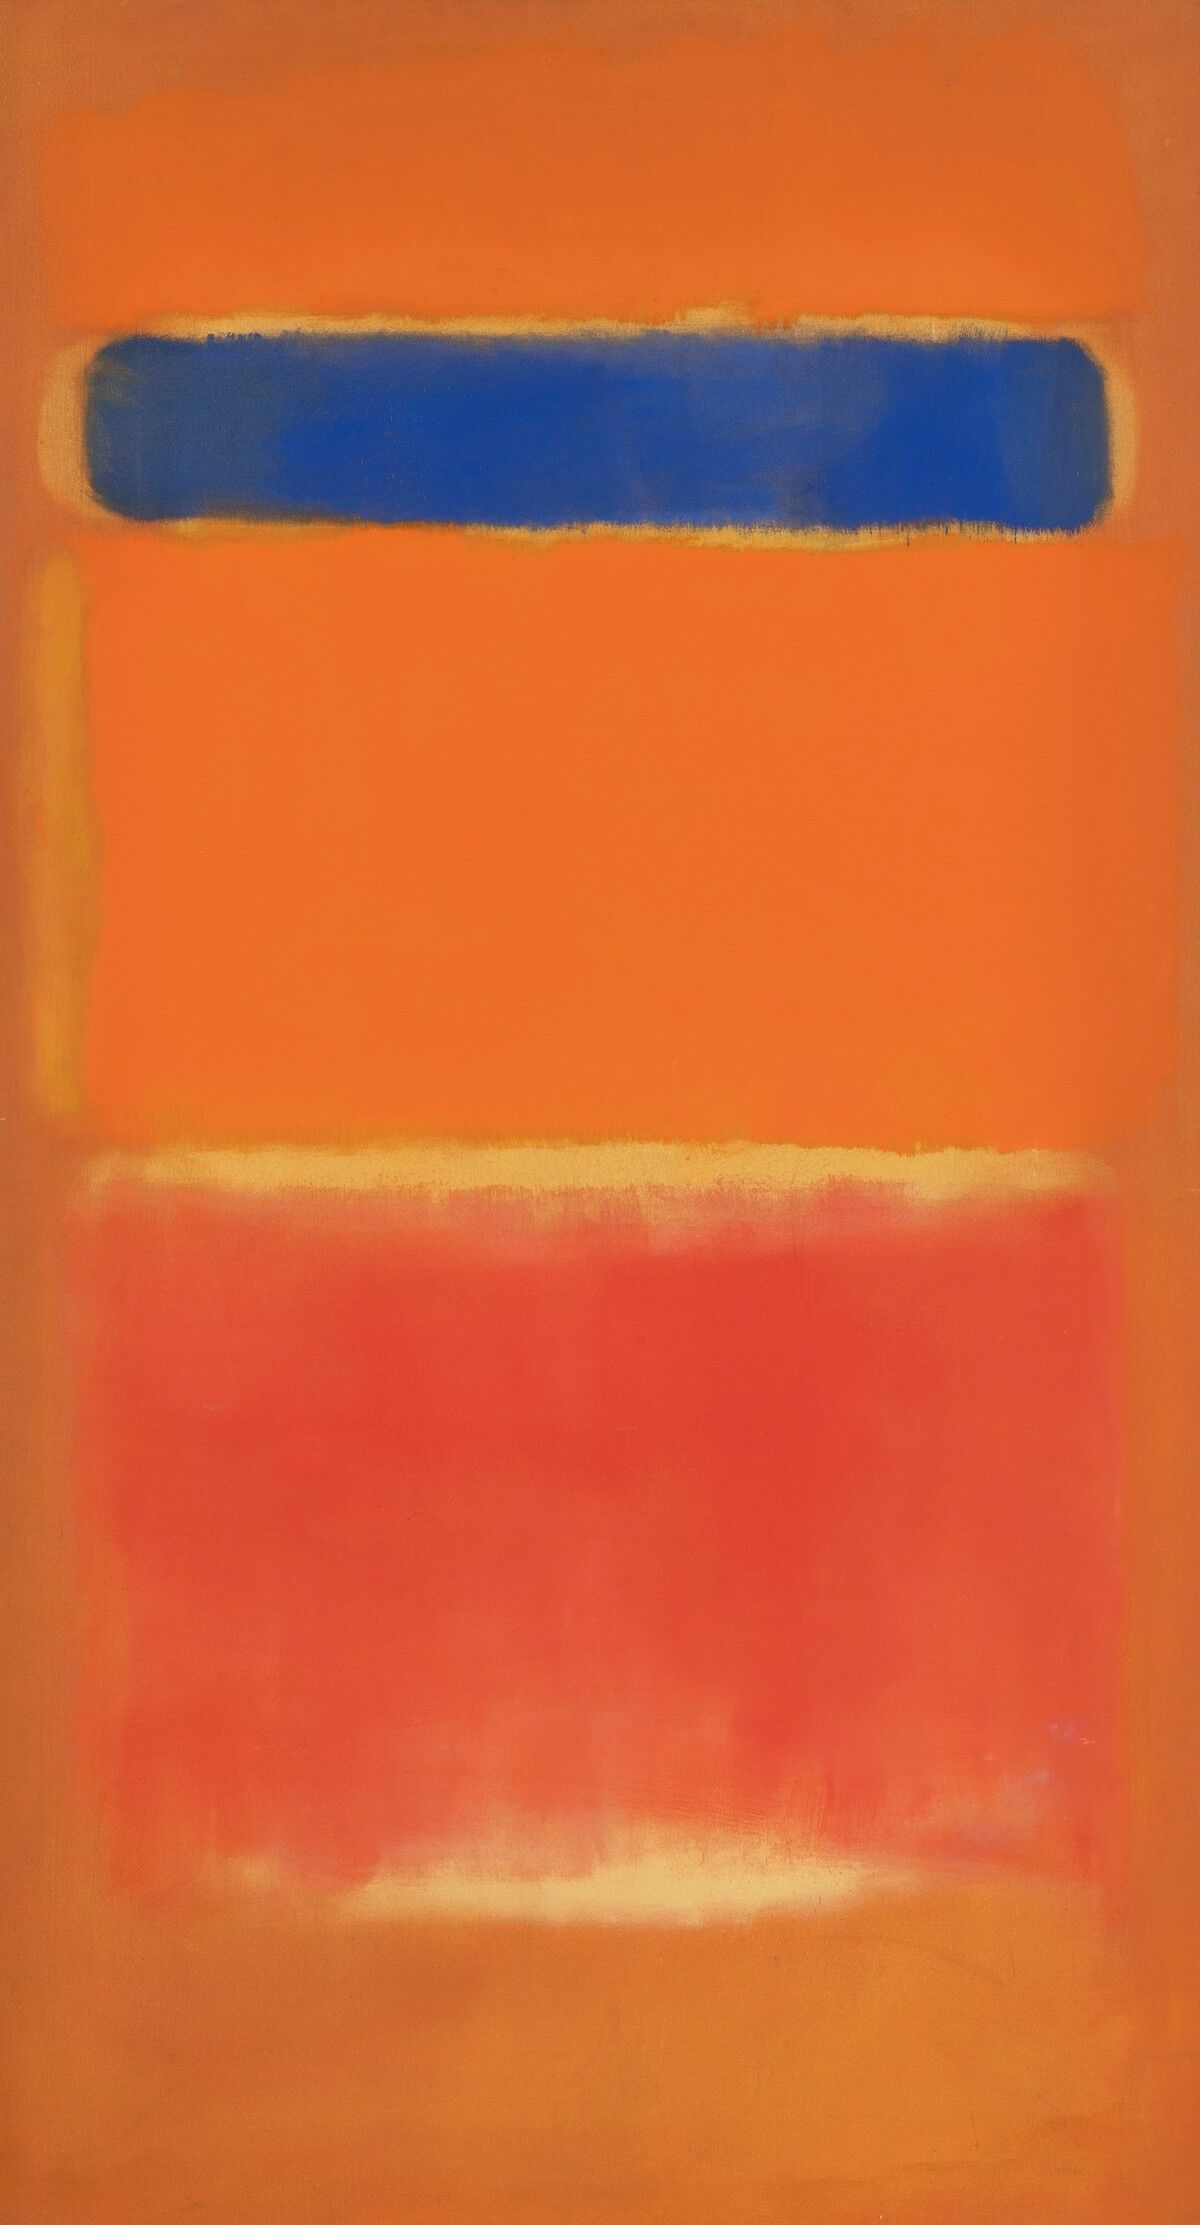 Mark Rothko, Blue Over Red, 1953. Est. $25 million–35 million. Courtesy Sotheby's.